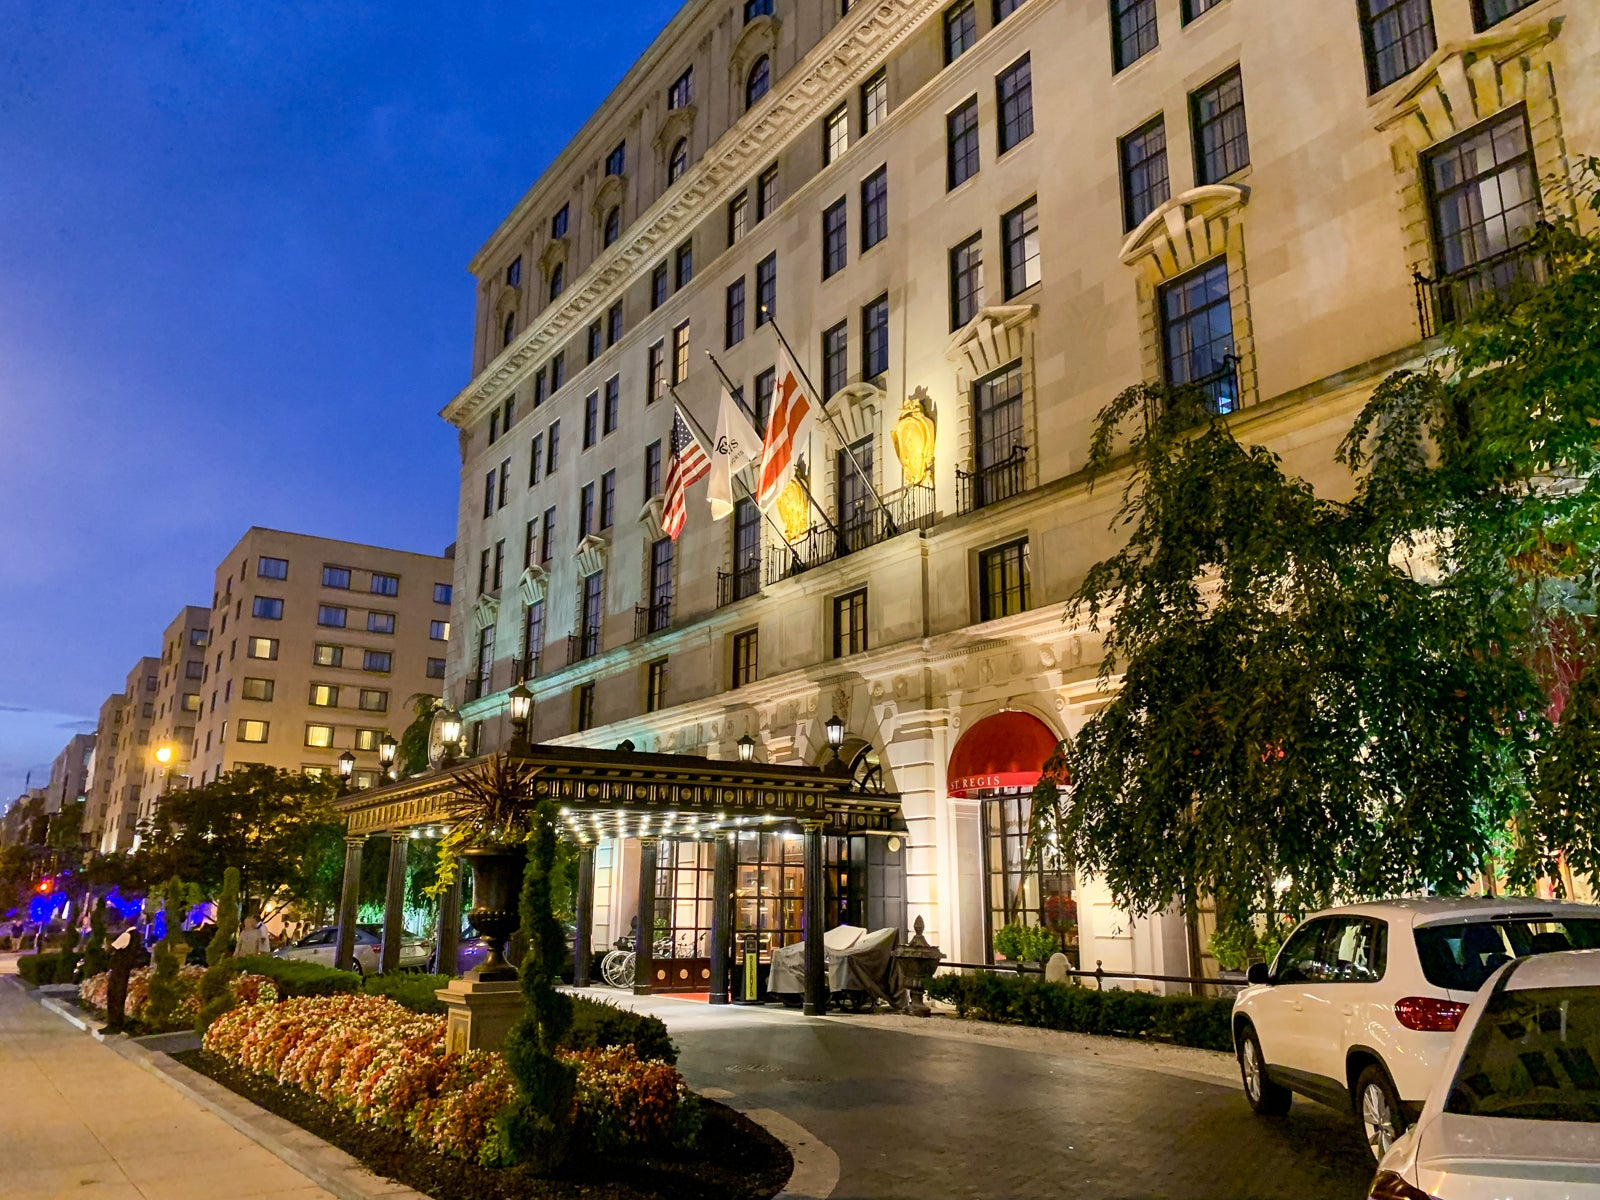 A Review of The St. Regis Washington DC